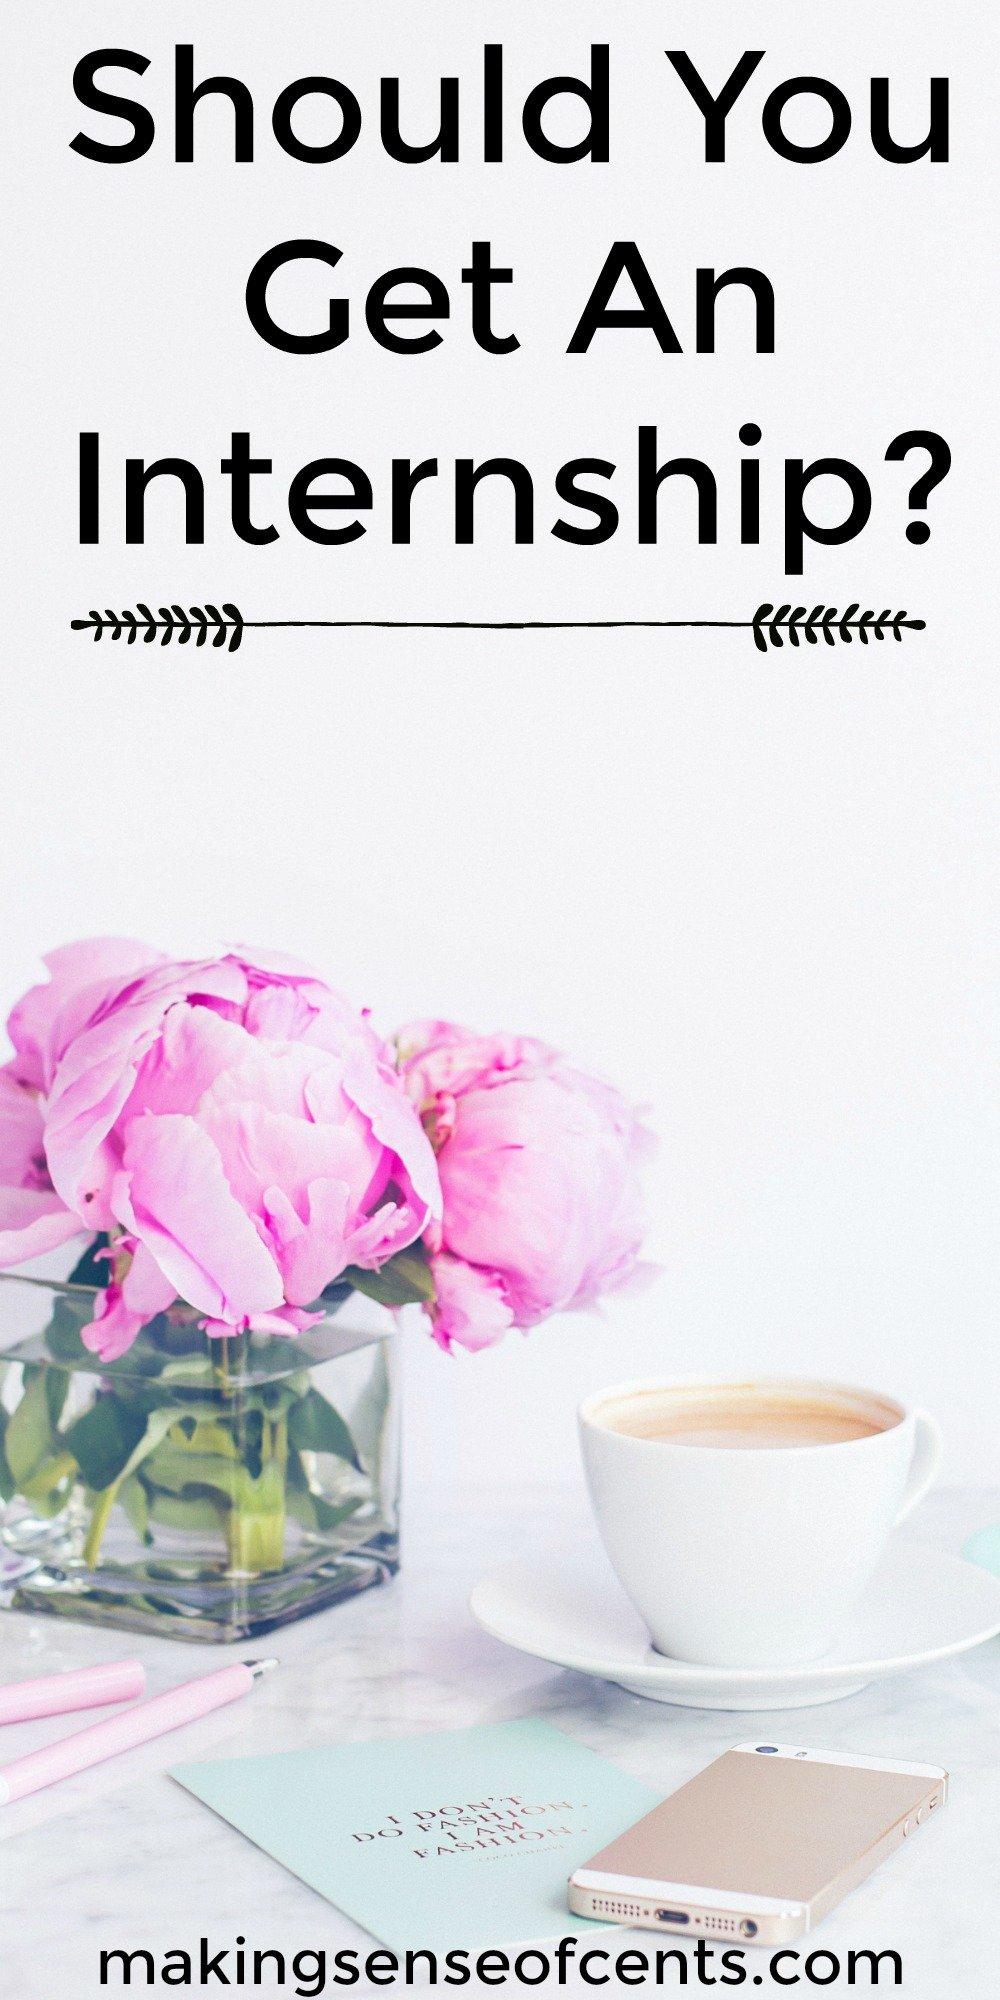 Should You Get An Internship?